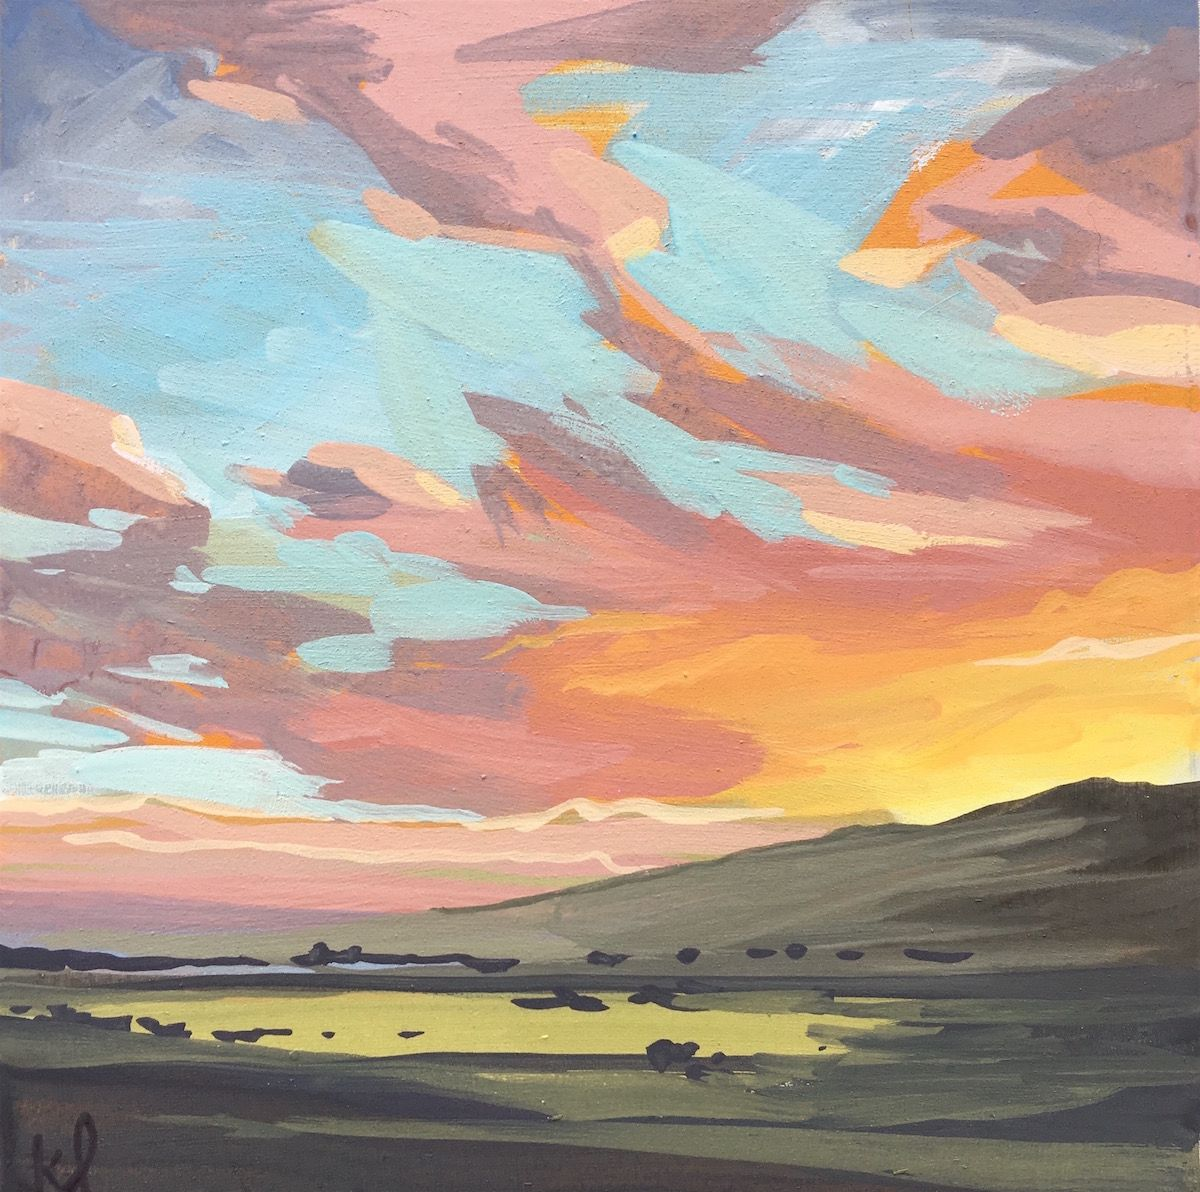 Grapefruit Sunset Sky — Khara Ledonne